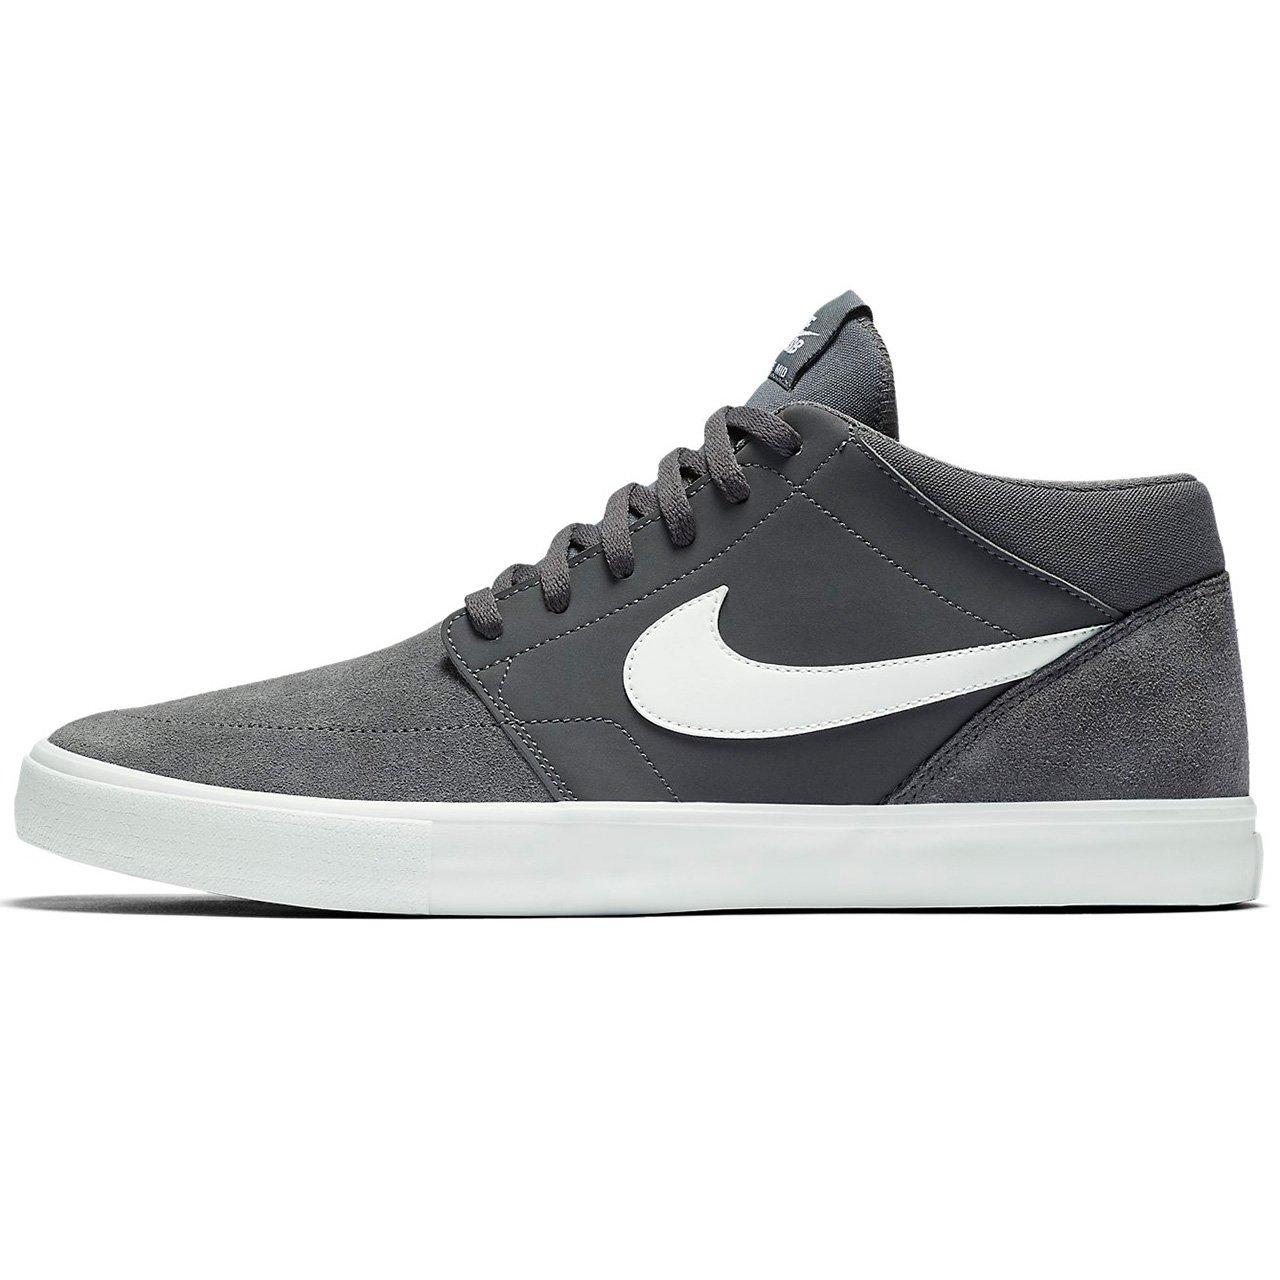 a08535edf62cb Nike Mens SB Portmore II Solar MID Dark Grey White Size 8.5